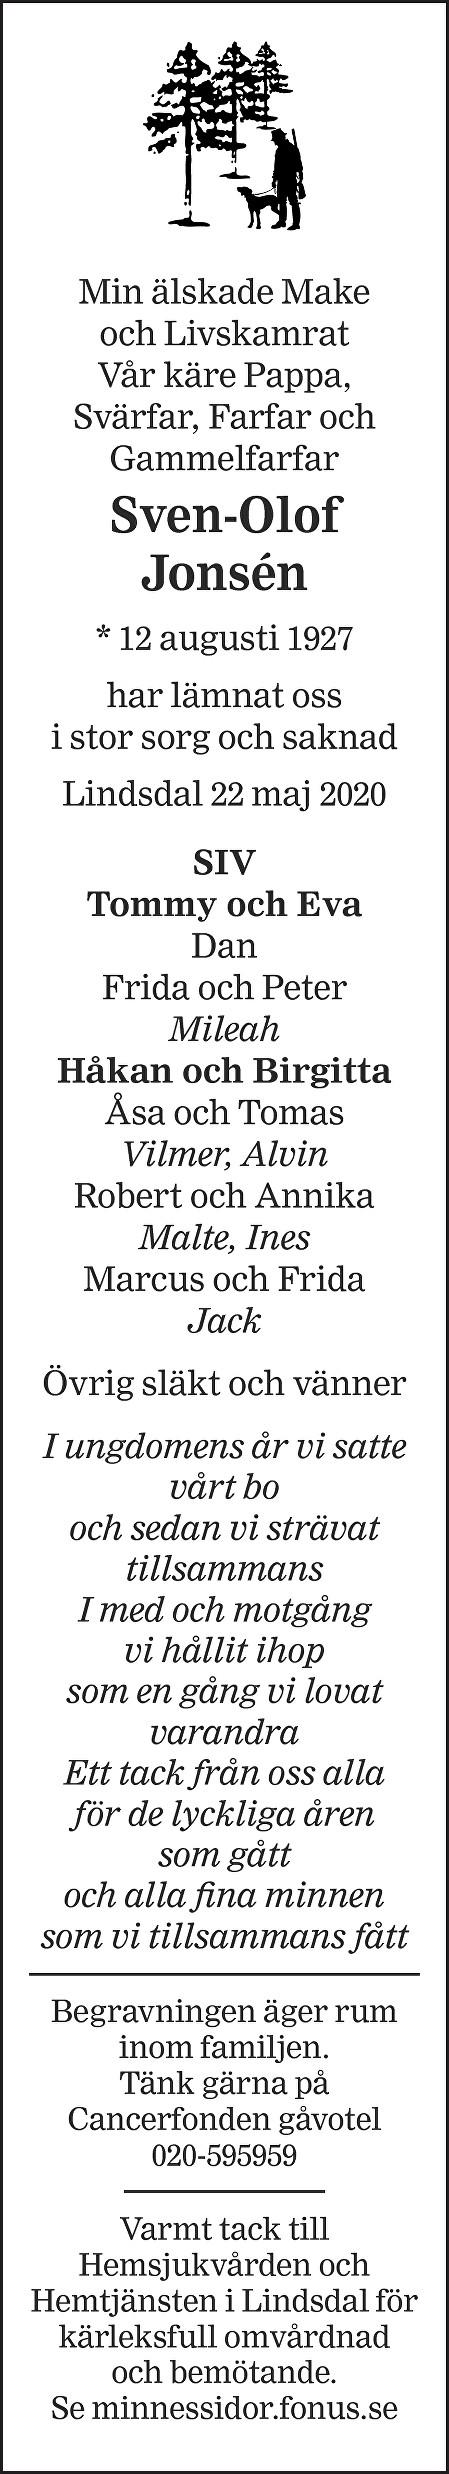 Sven-Olof Jonsén Death notice